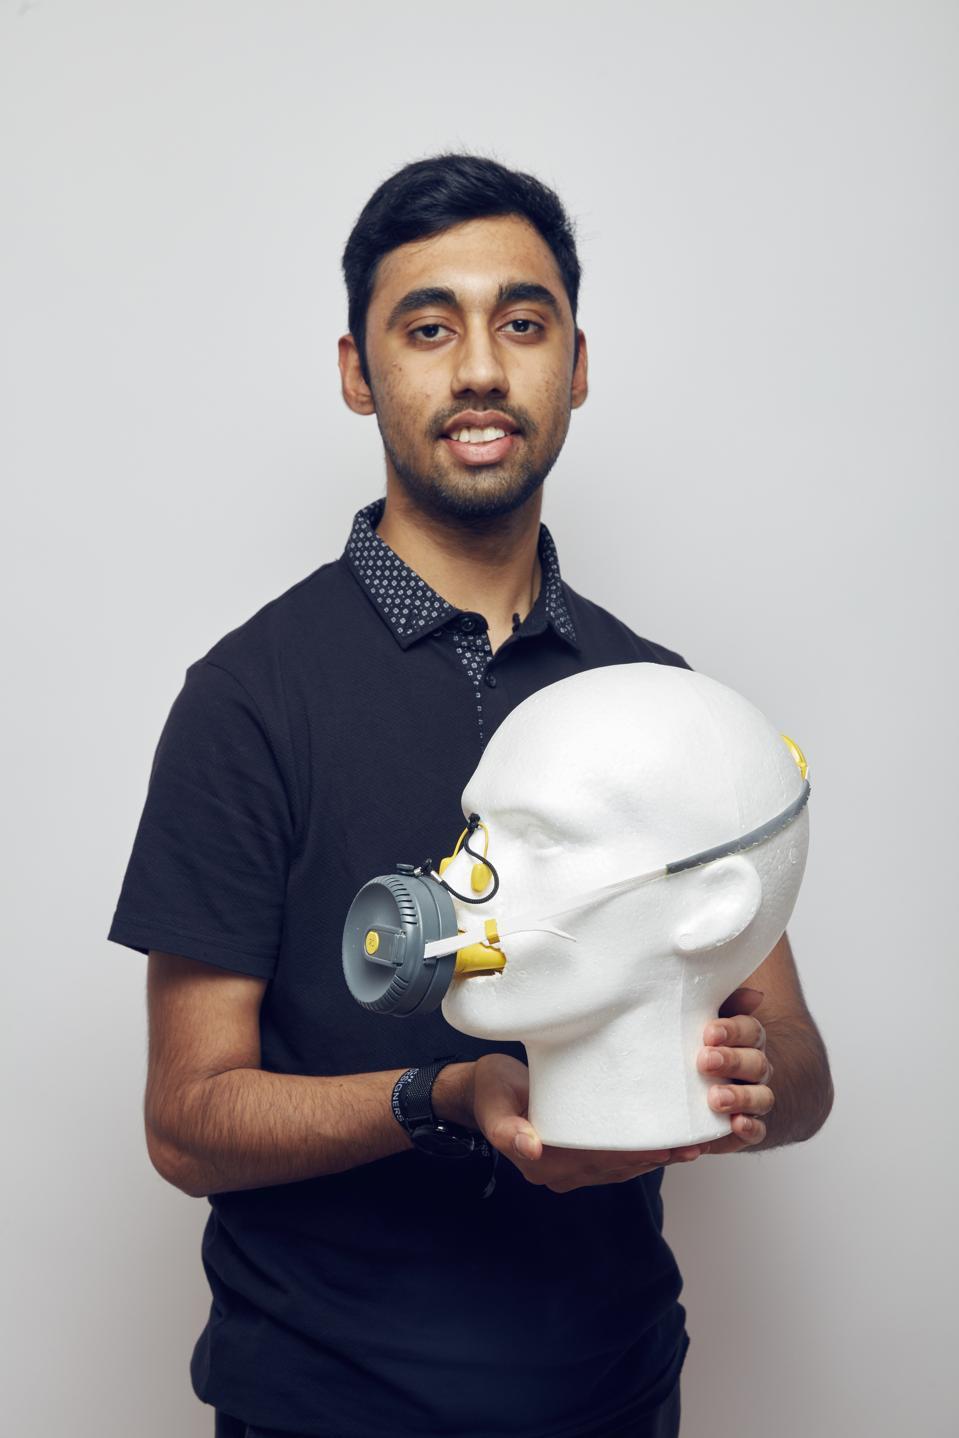 Winner of the Business Design Centre New Designers 2019 Award.